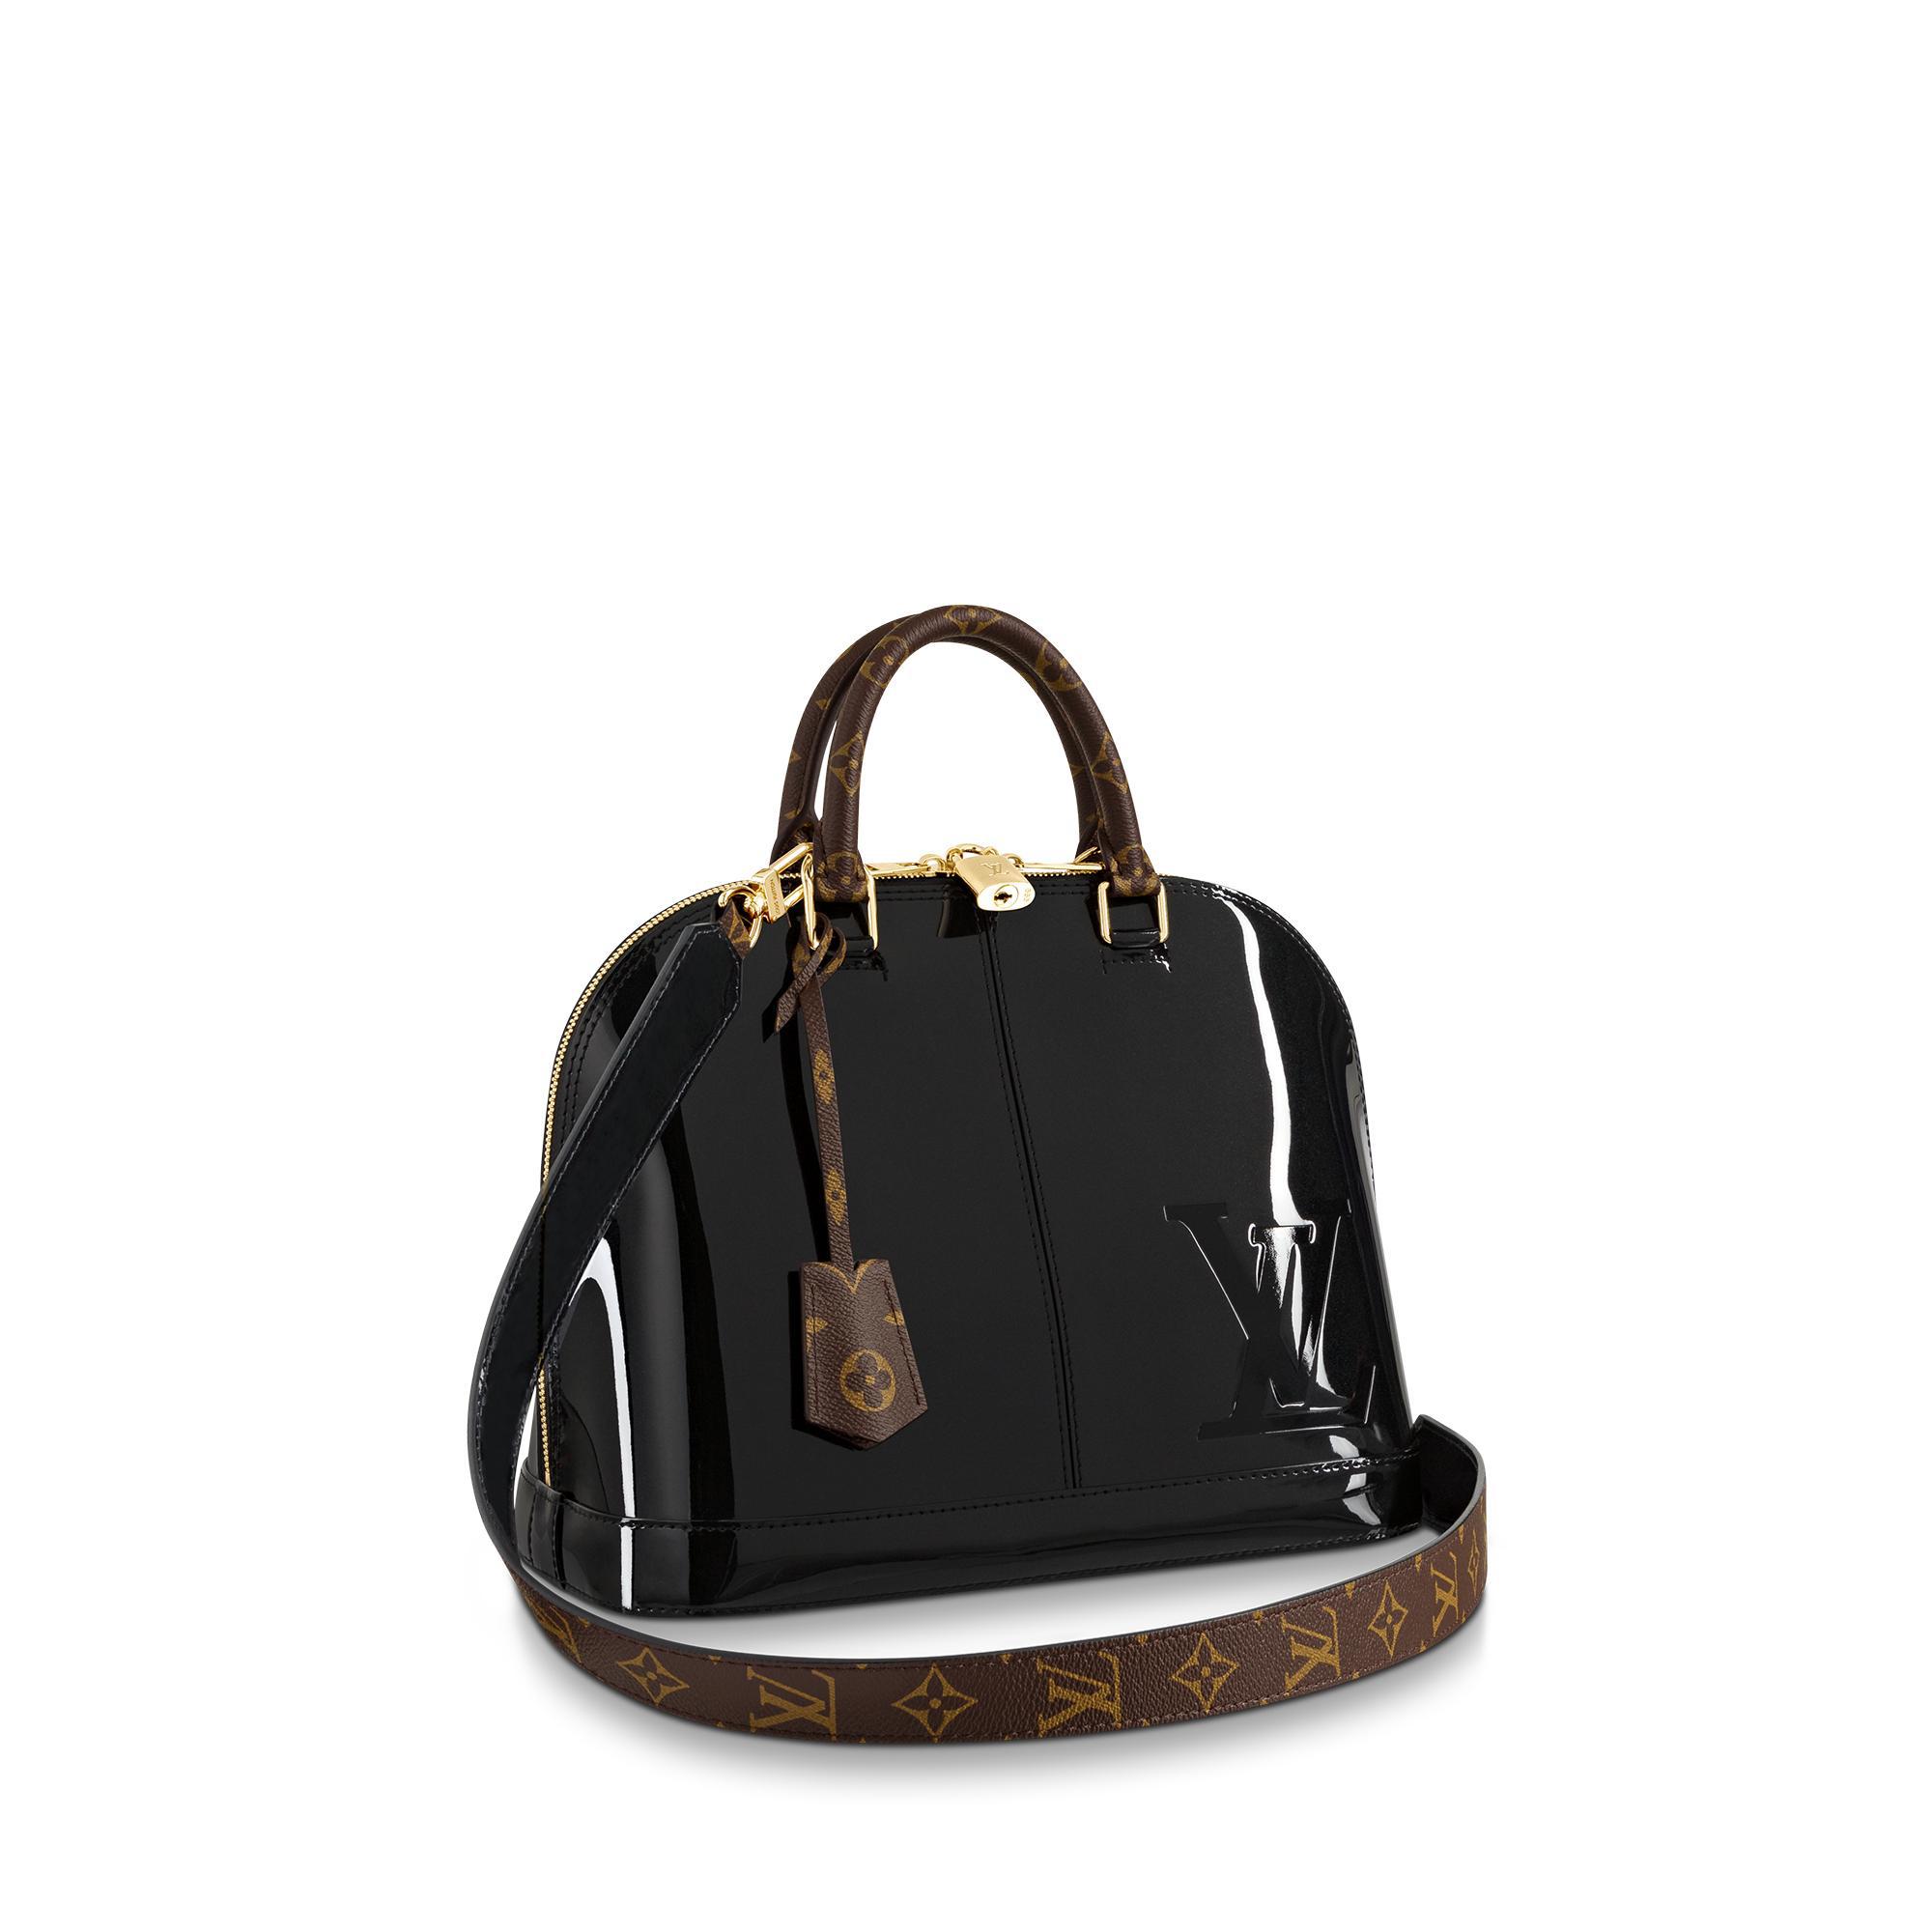 da97336302a6 Louis Vuitton Alma Pm In Patent Leather